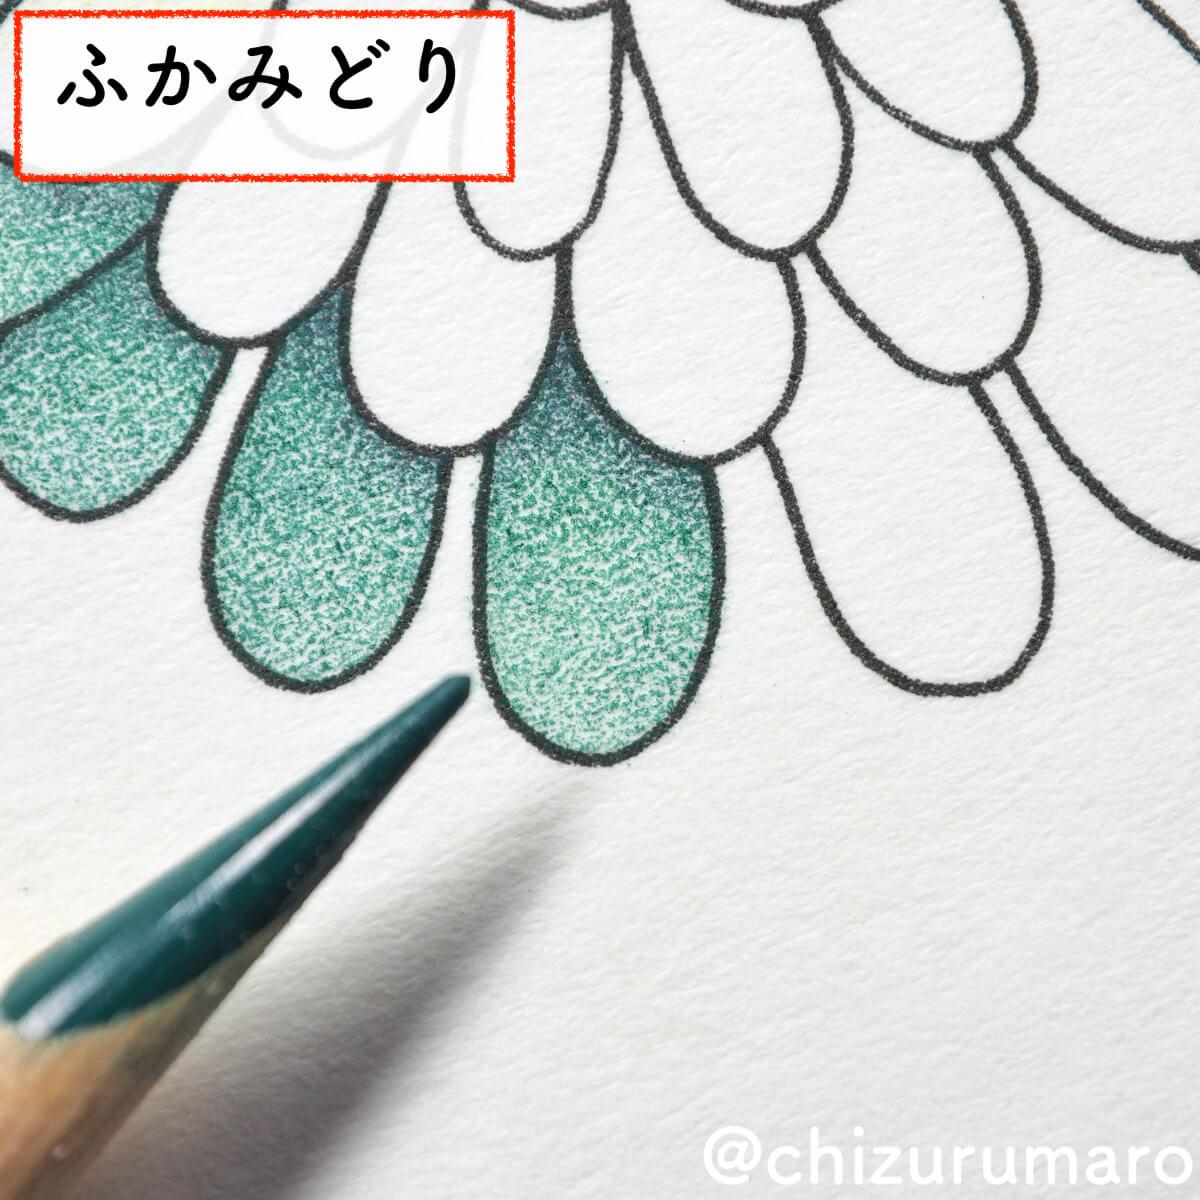 f:id:chizurumaro:20200430150528j:plain